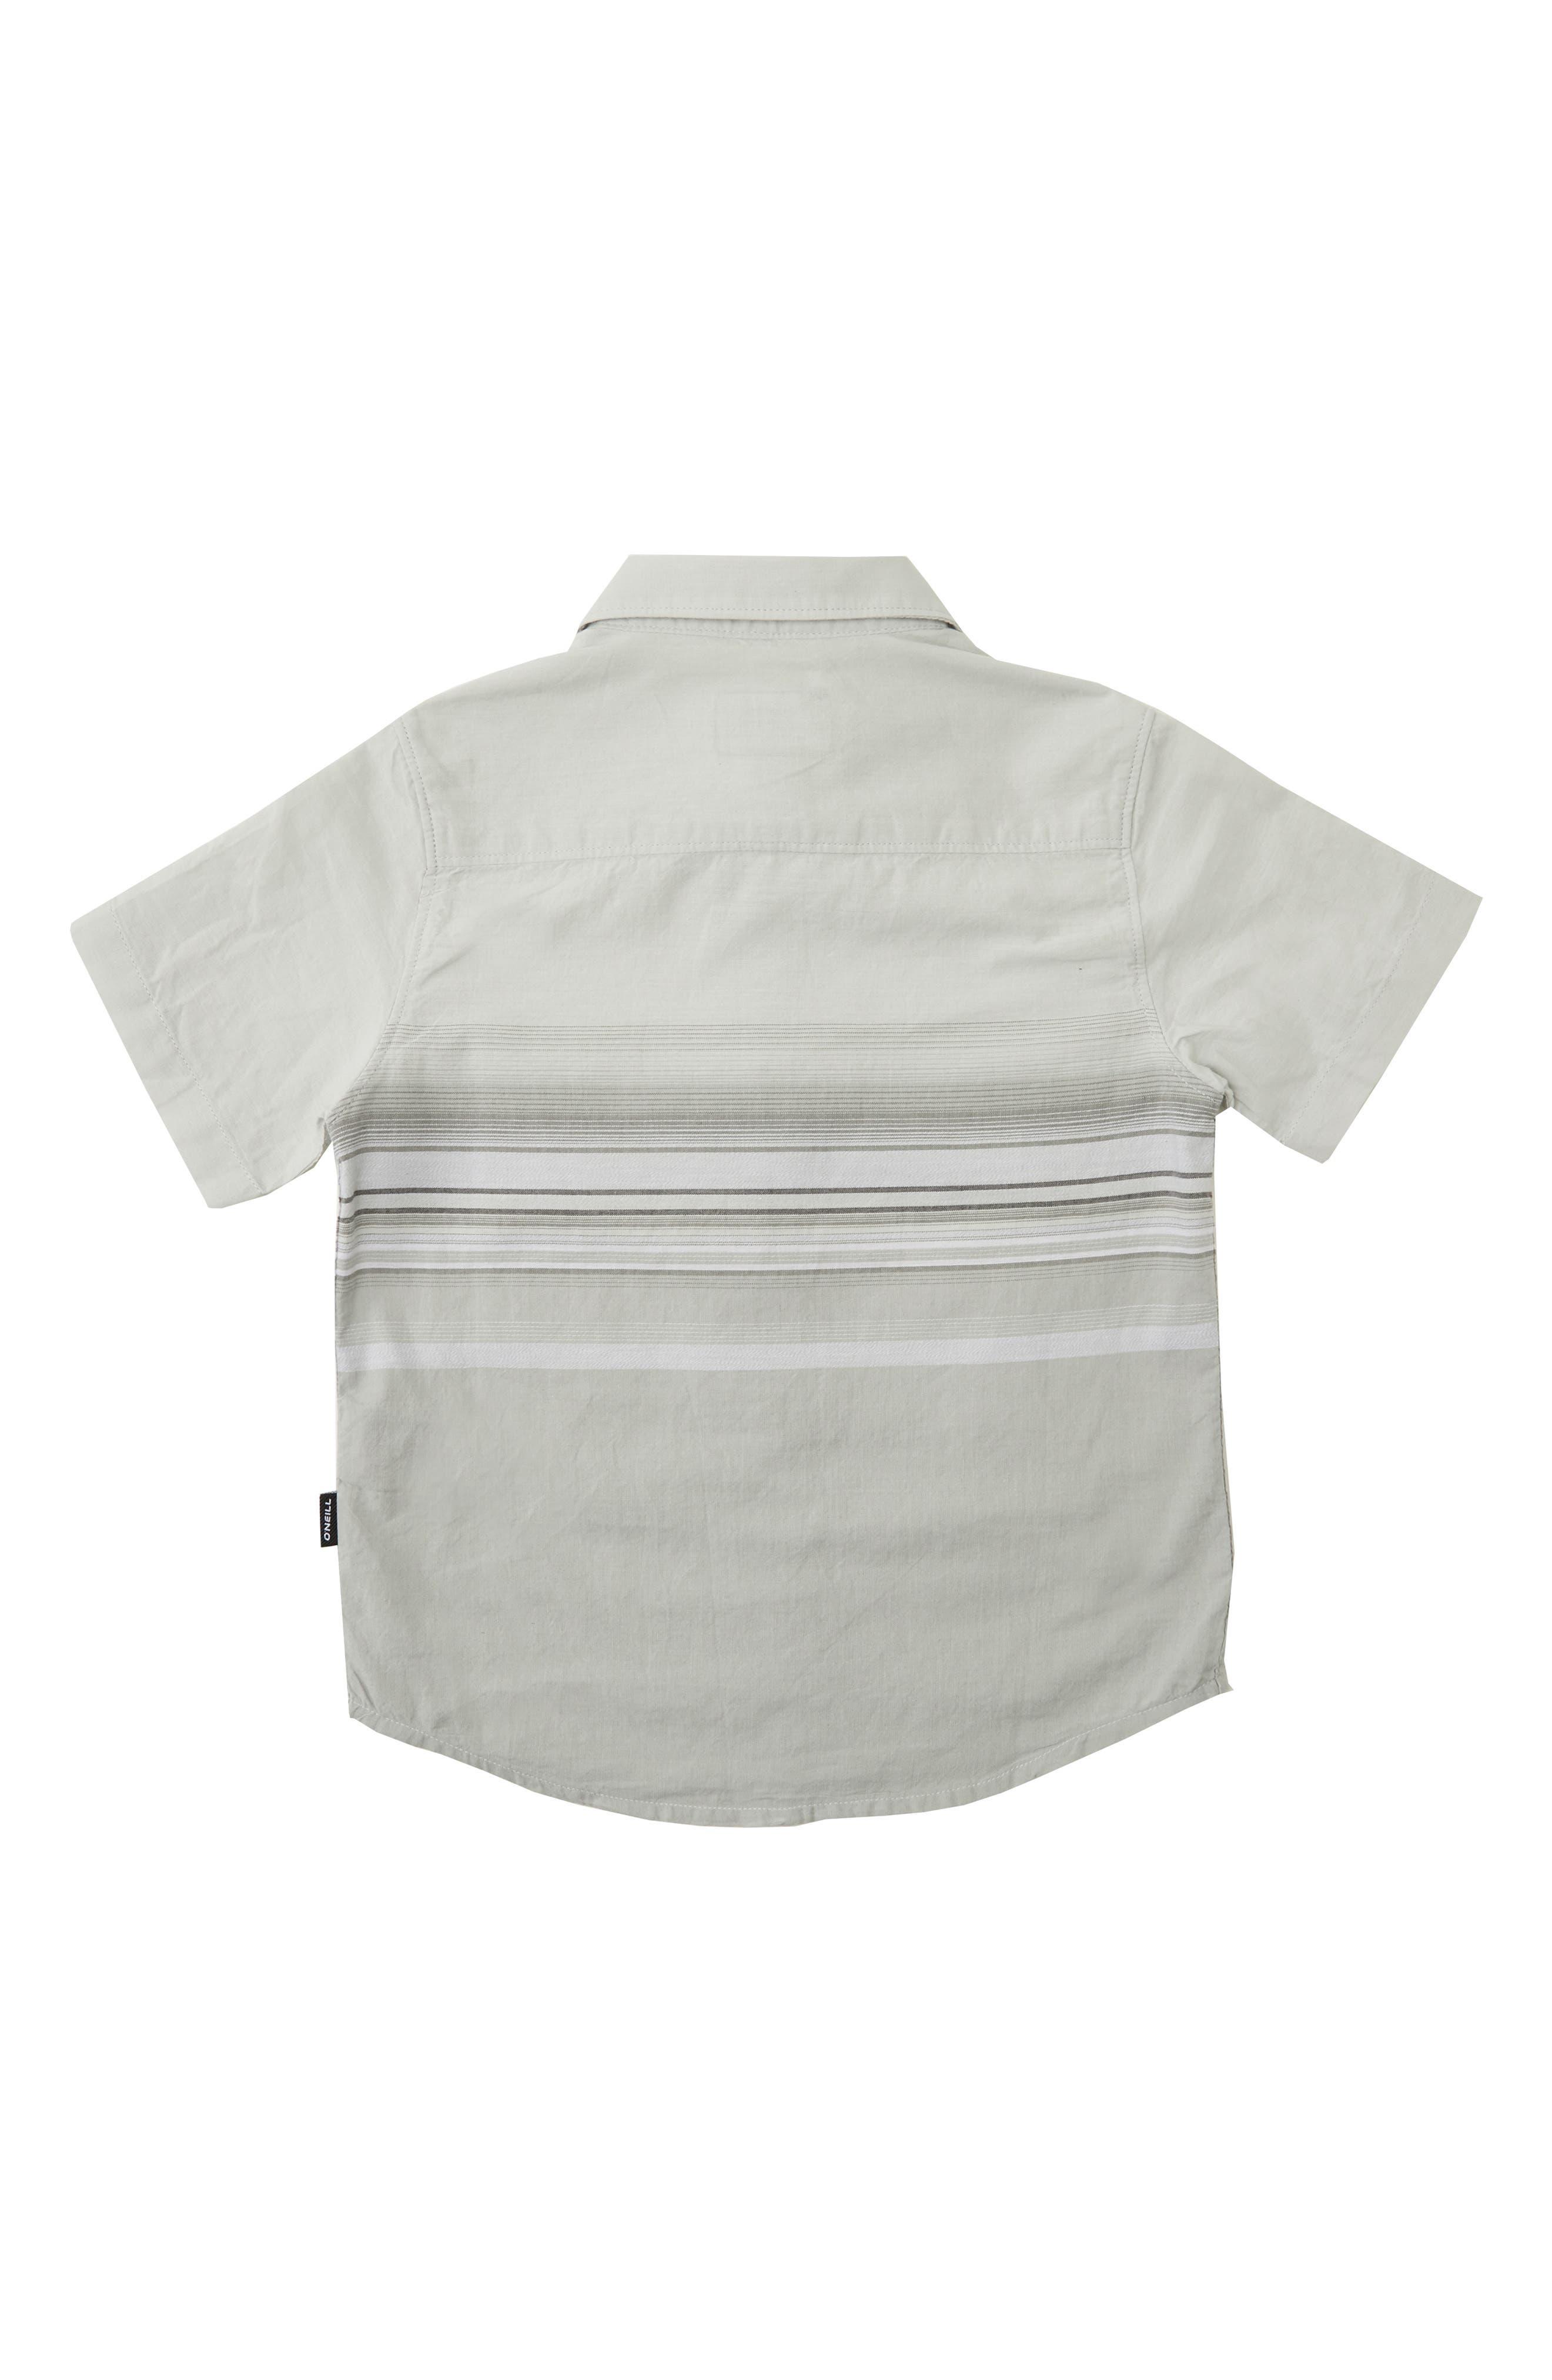 O'NEILL,                             Letting Go Woven Shirt,                             Alternate thumbnail 2, color,                             LIGHT GREY